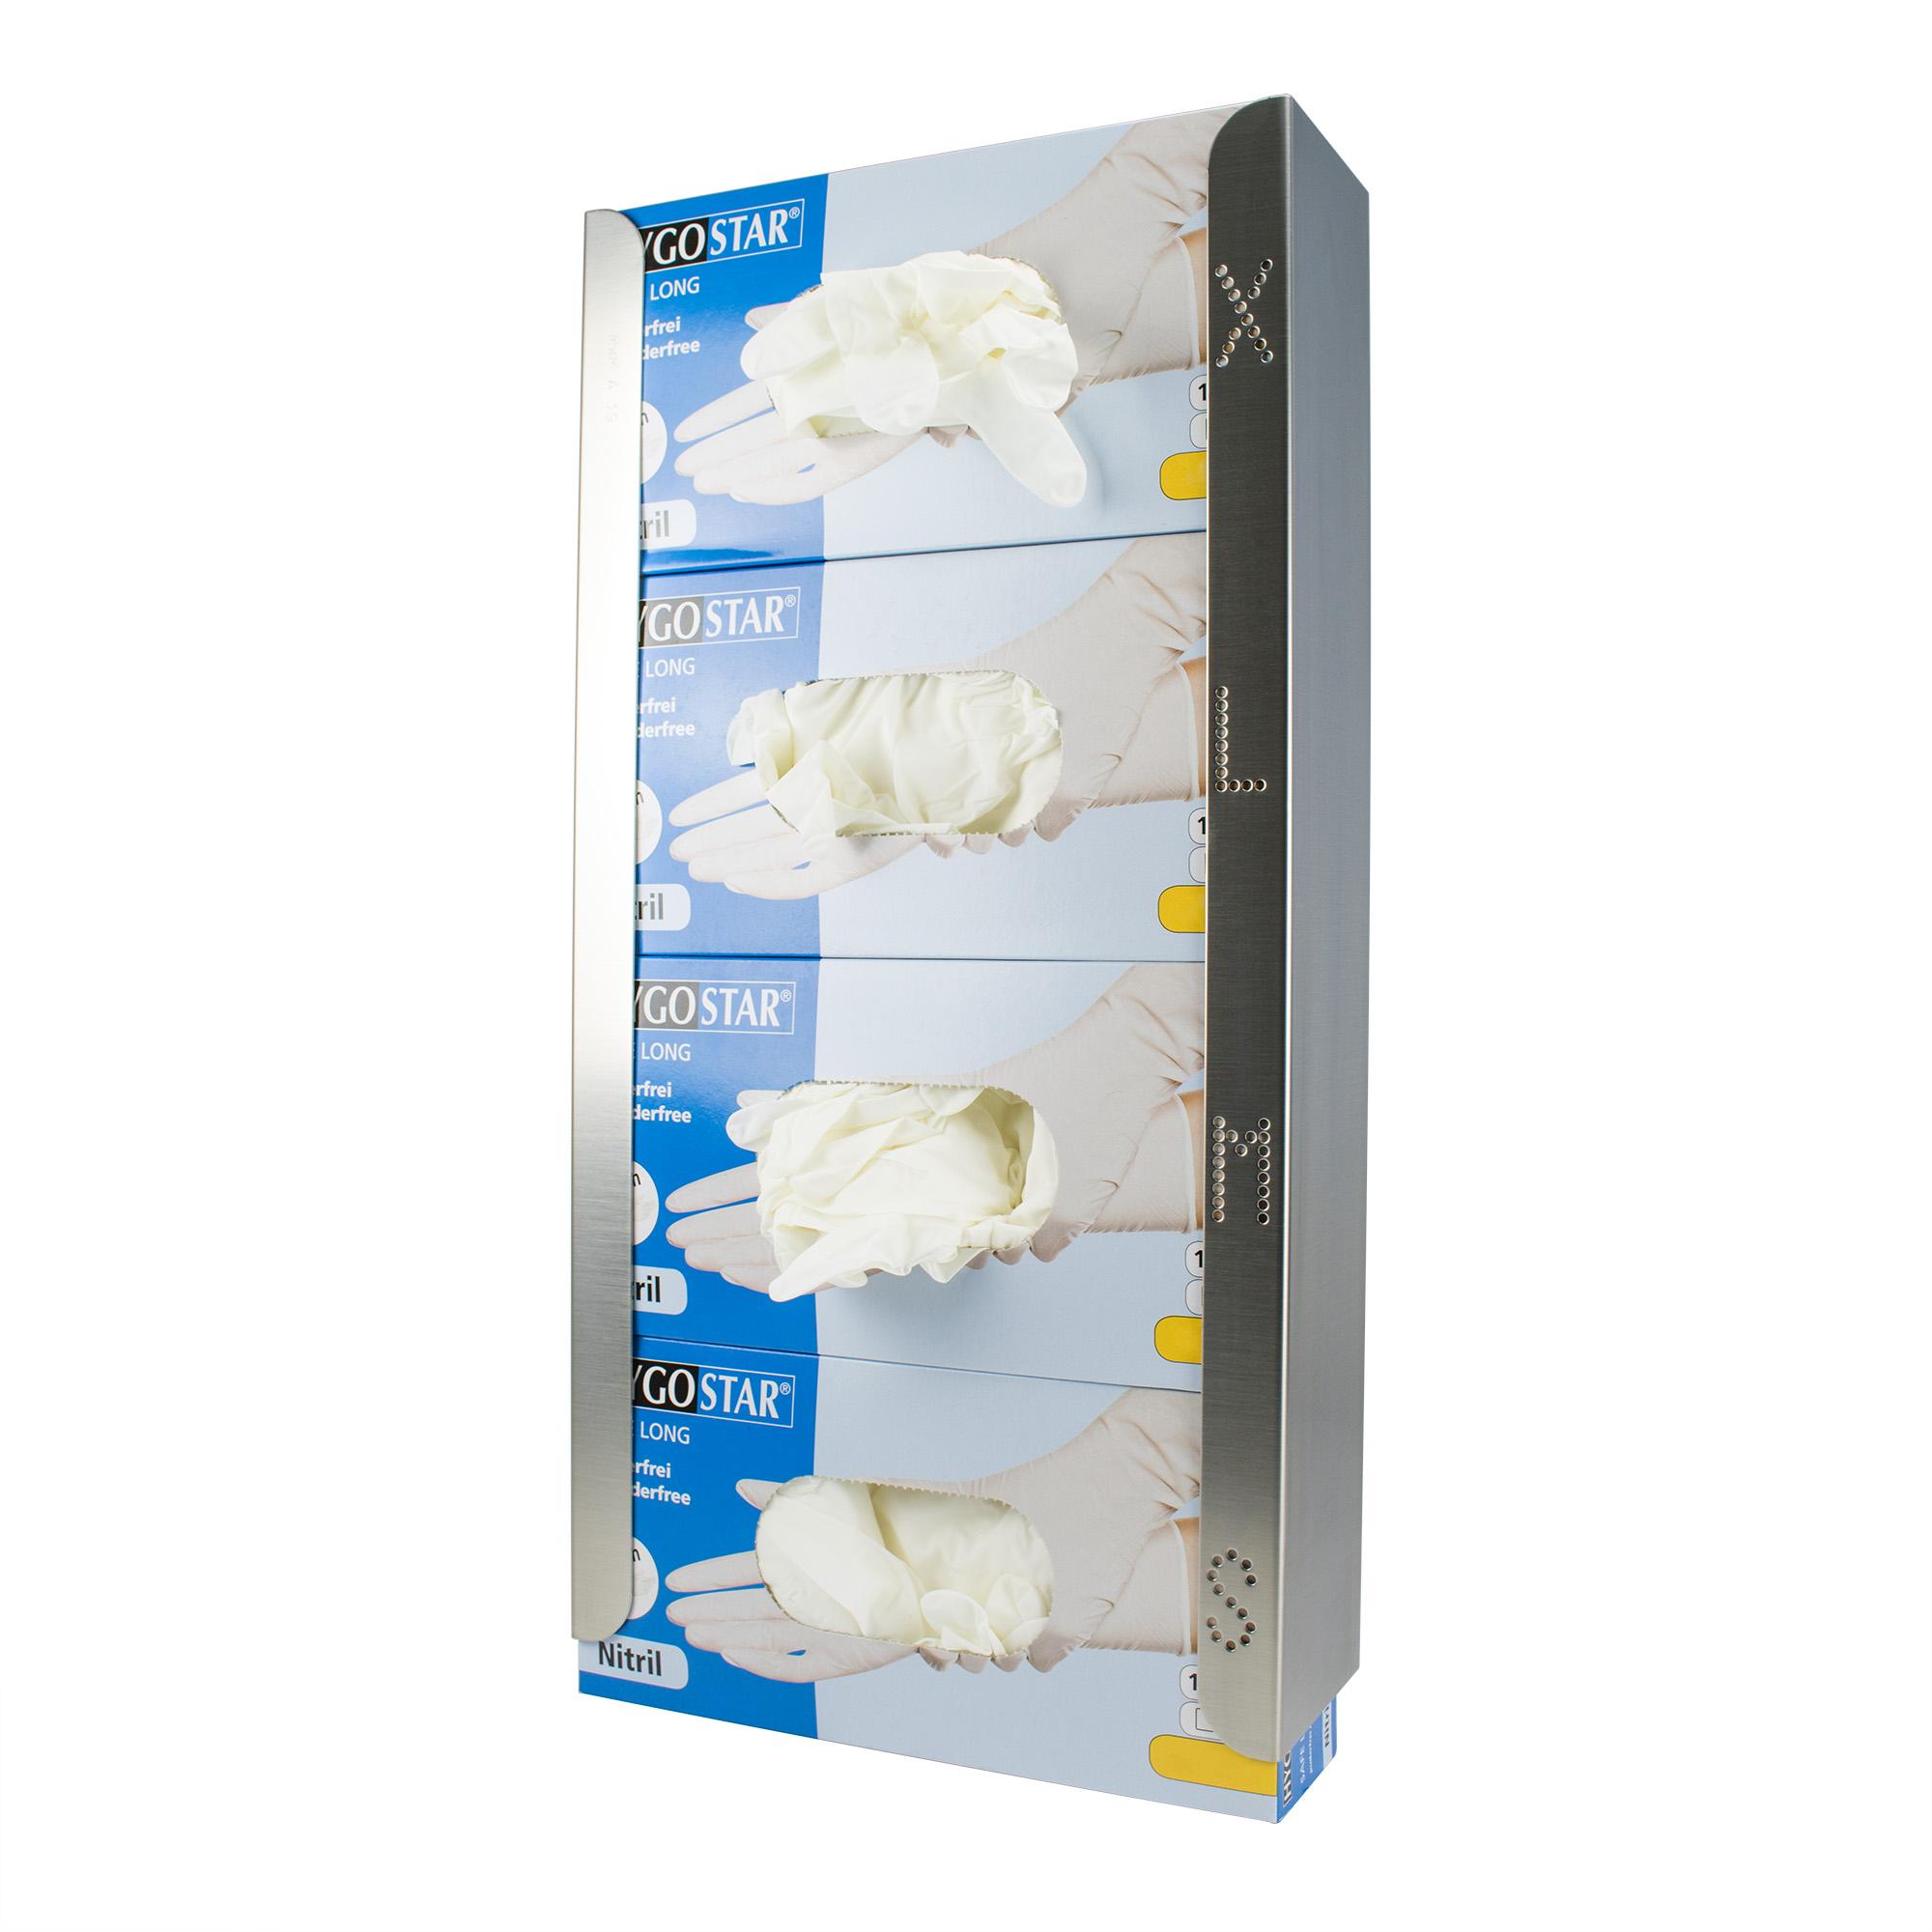 Edelstahlspender für Handschuhe Image